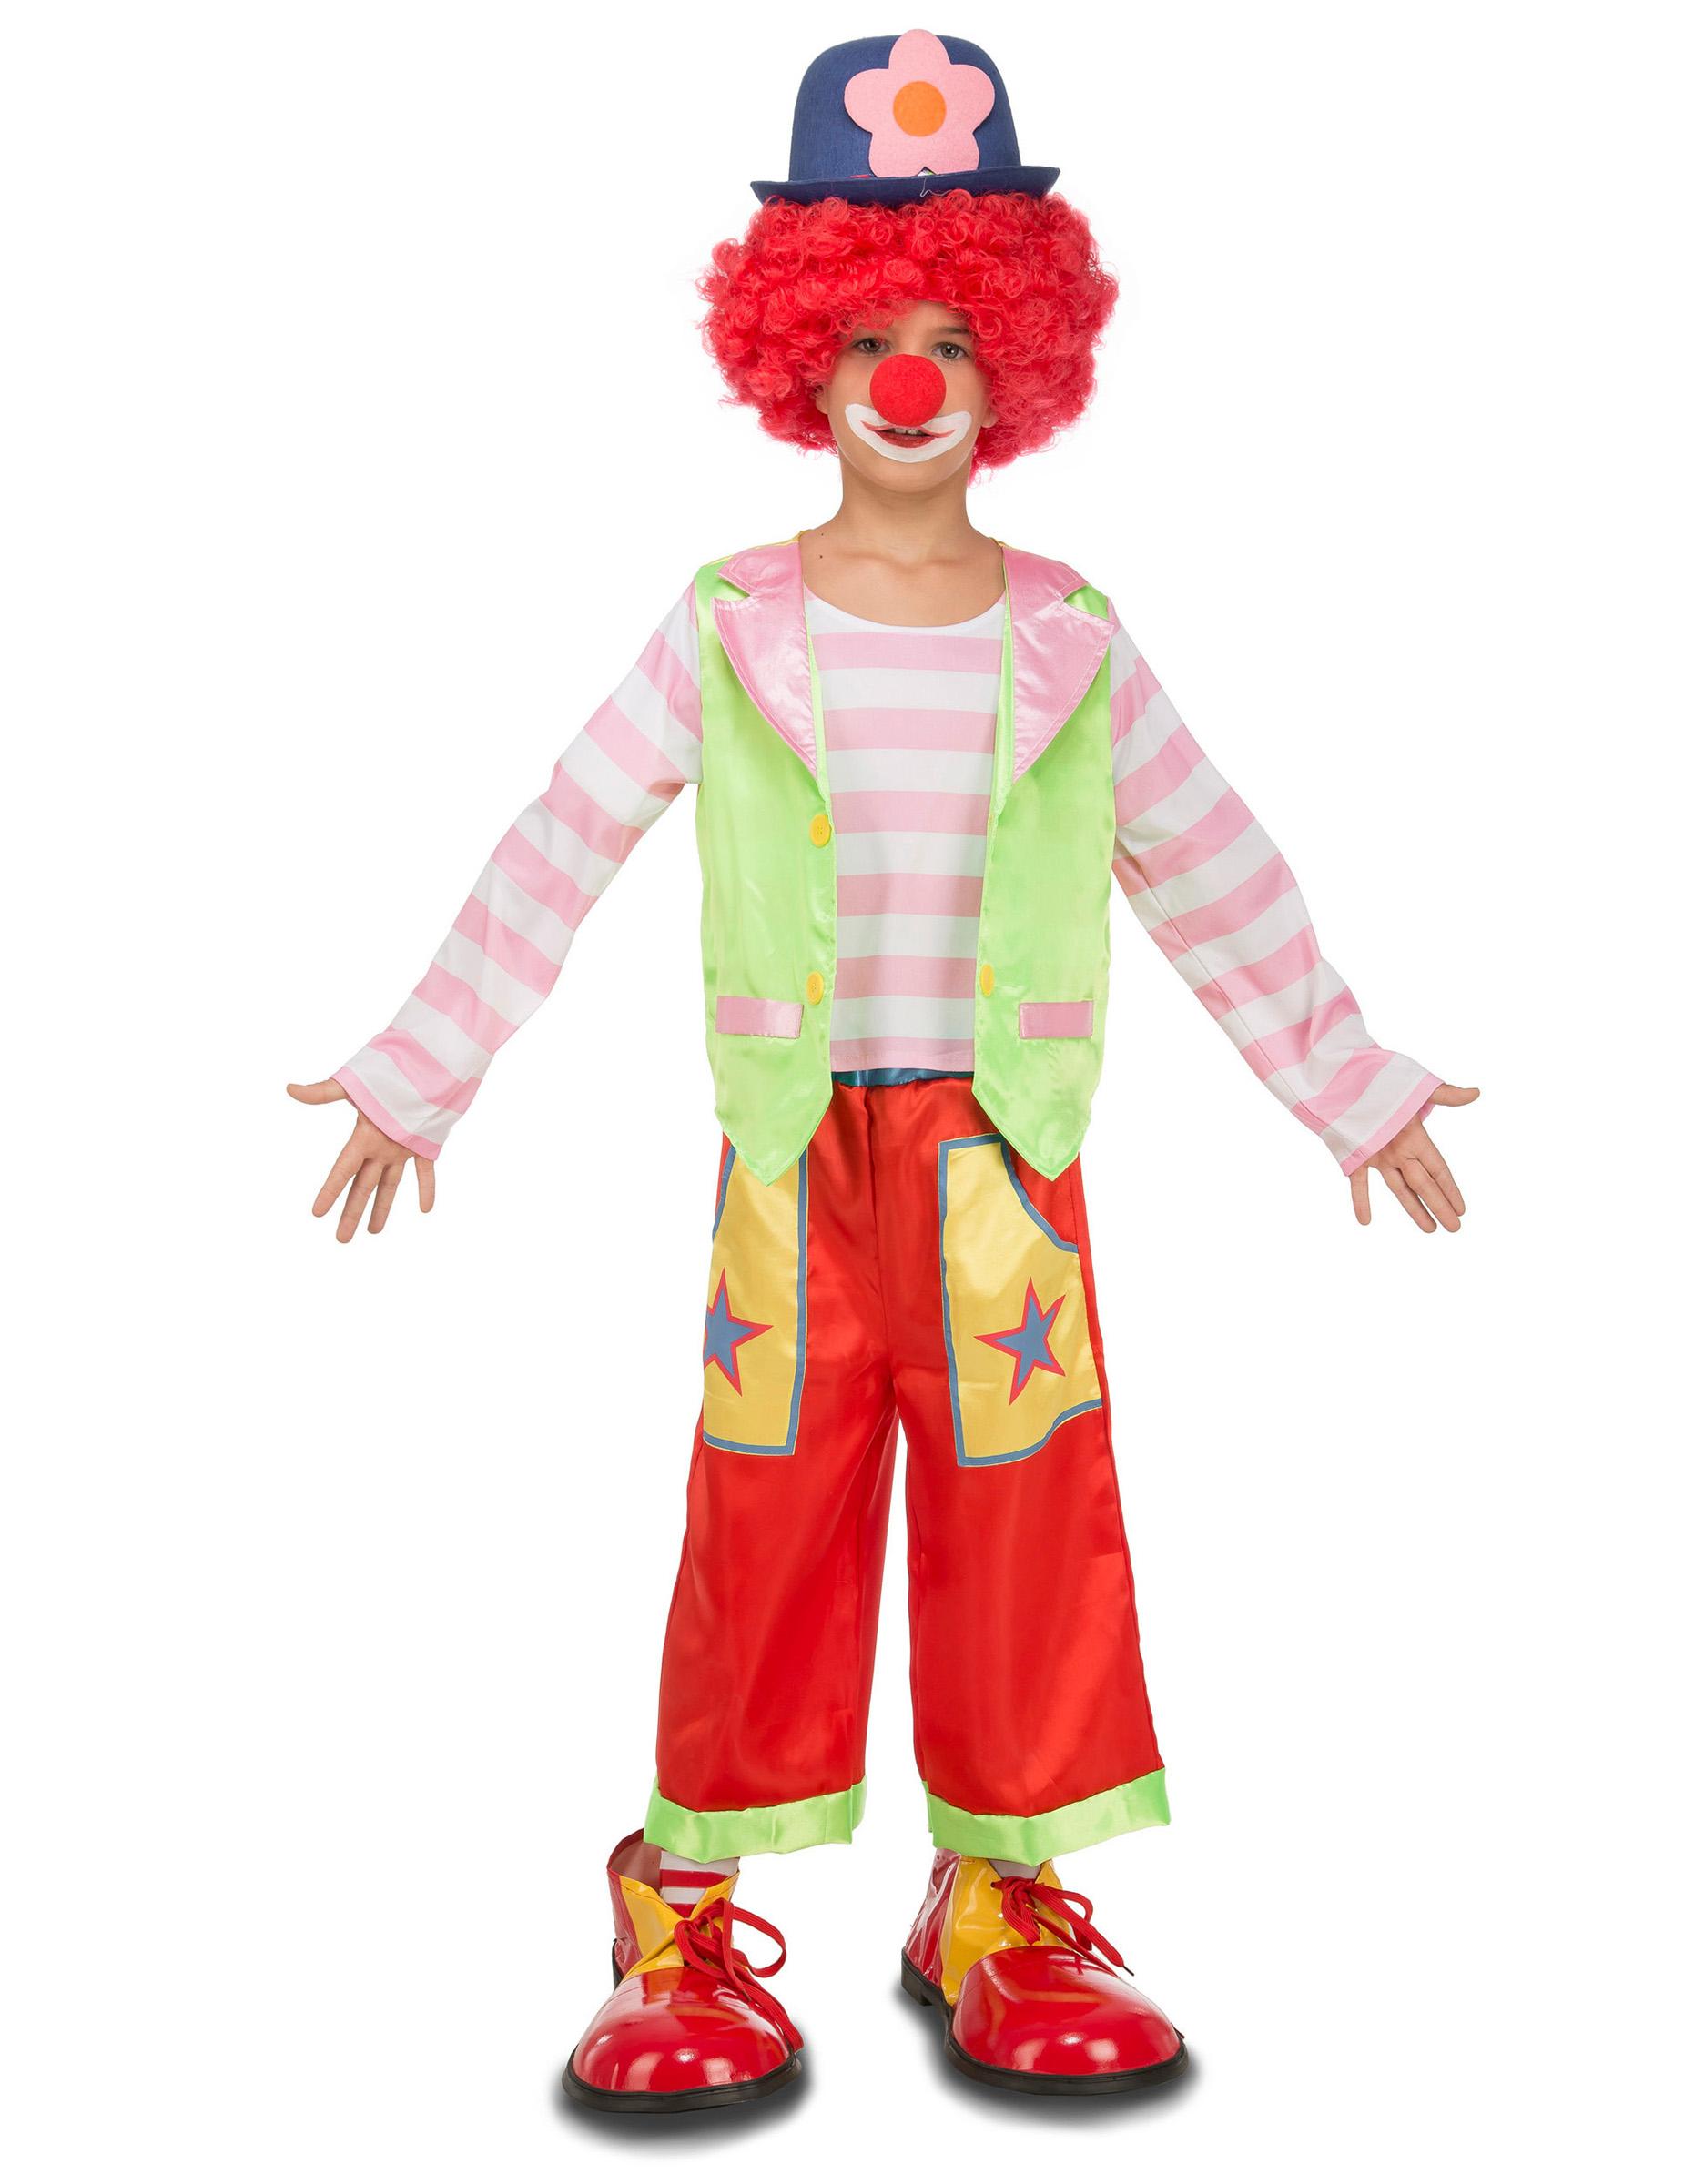 Rodeo Clown Kinderkost 252 M Kost 252 Me F 252 R Kinder Und G 252 Nstige